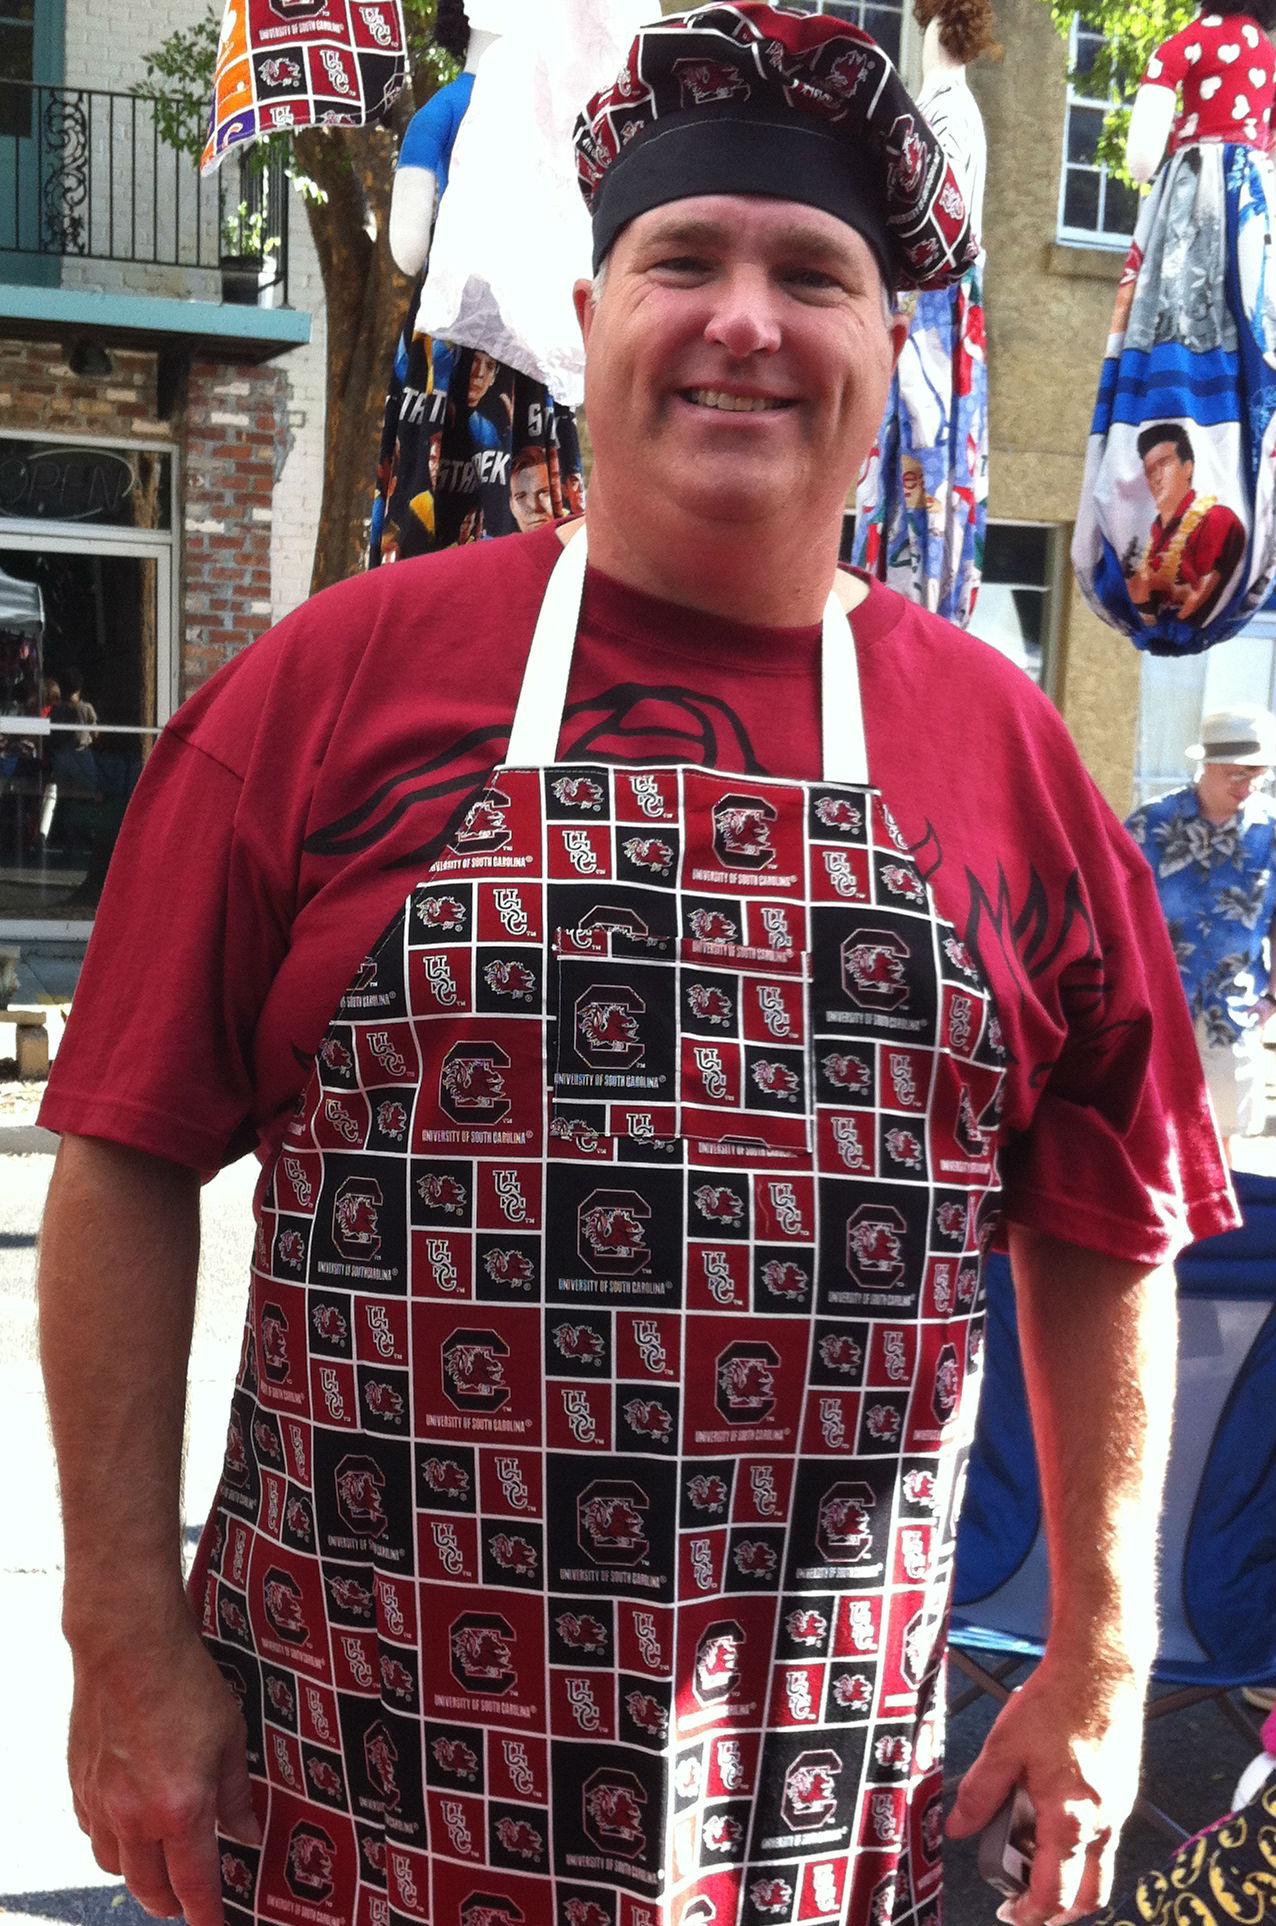 gamecocks apron.jpg